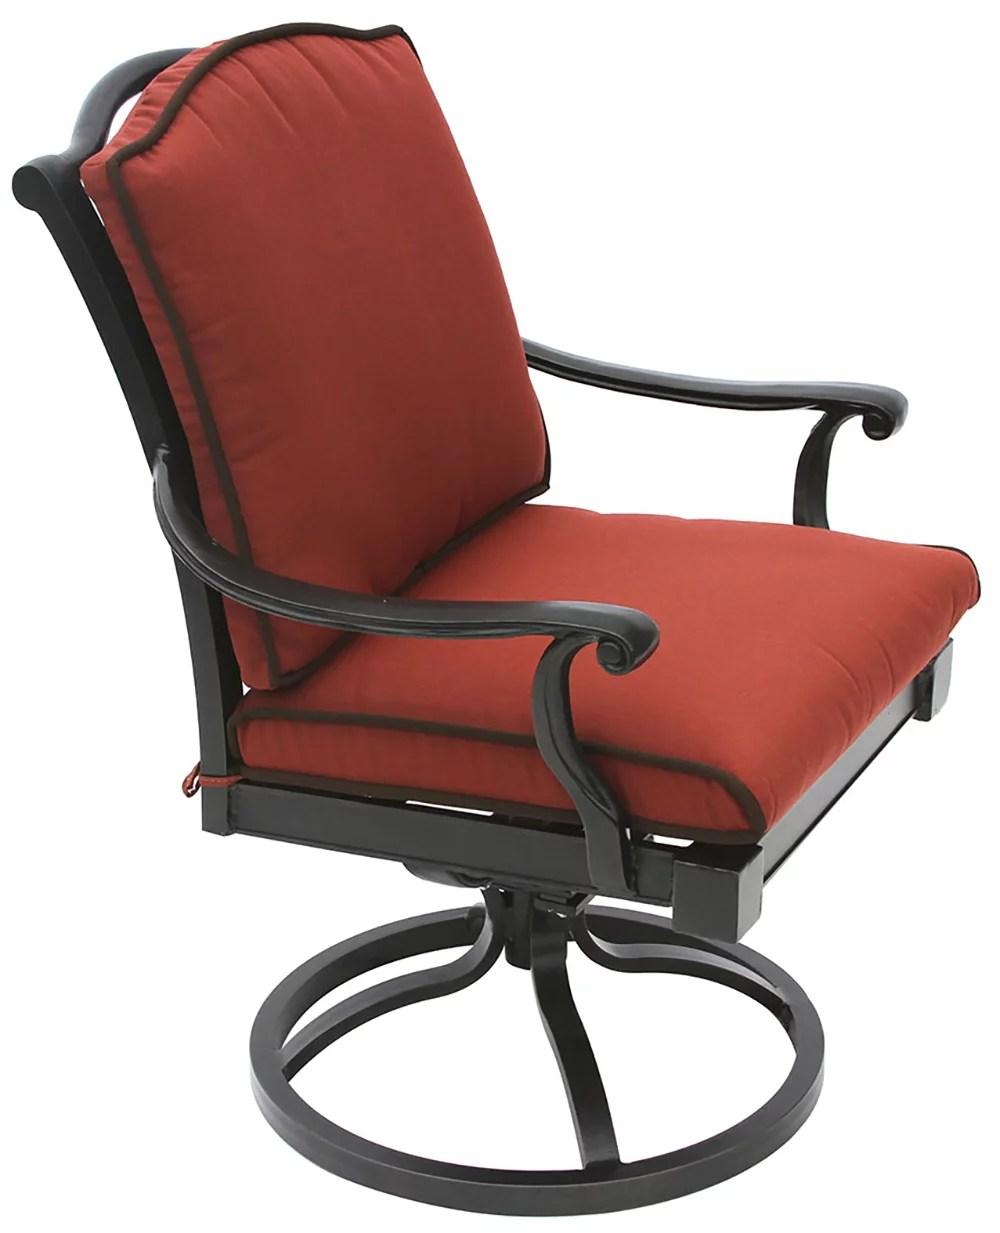 bahama cast aluminum outdoor patio swivel rocker chair with cushion walmart com